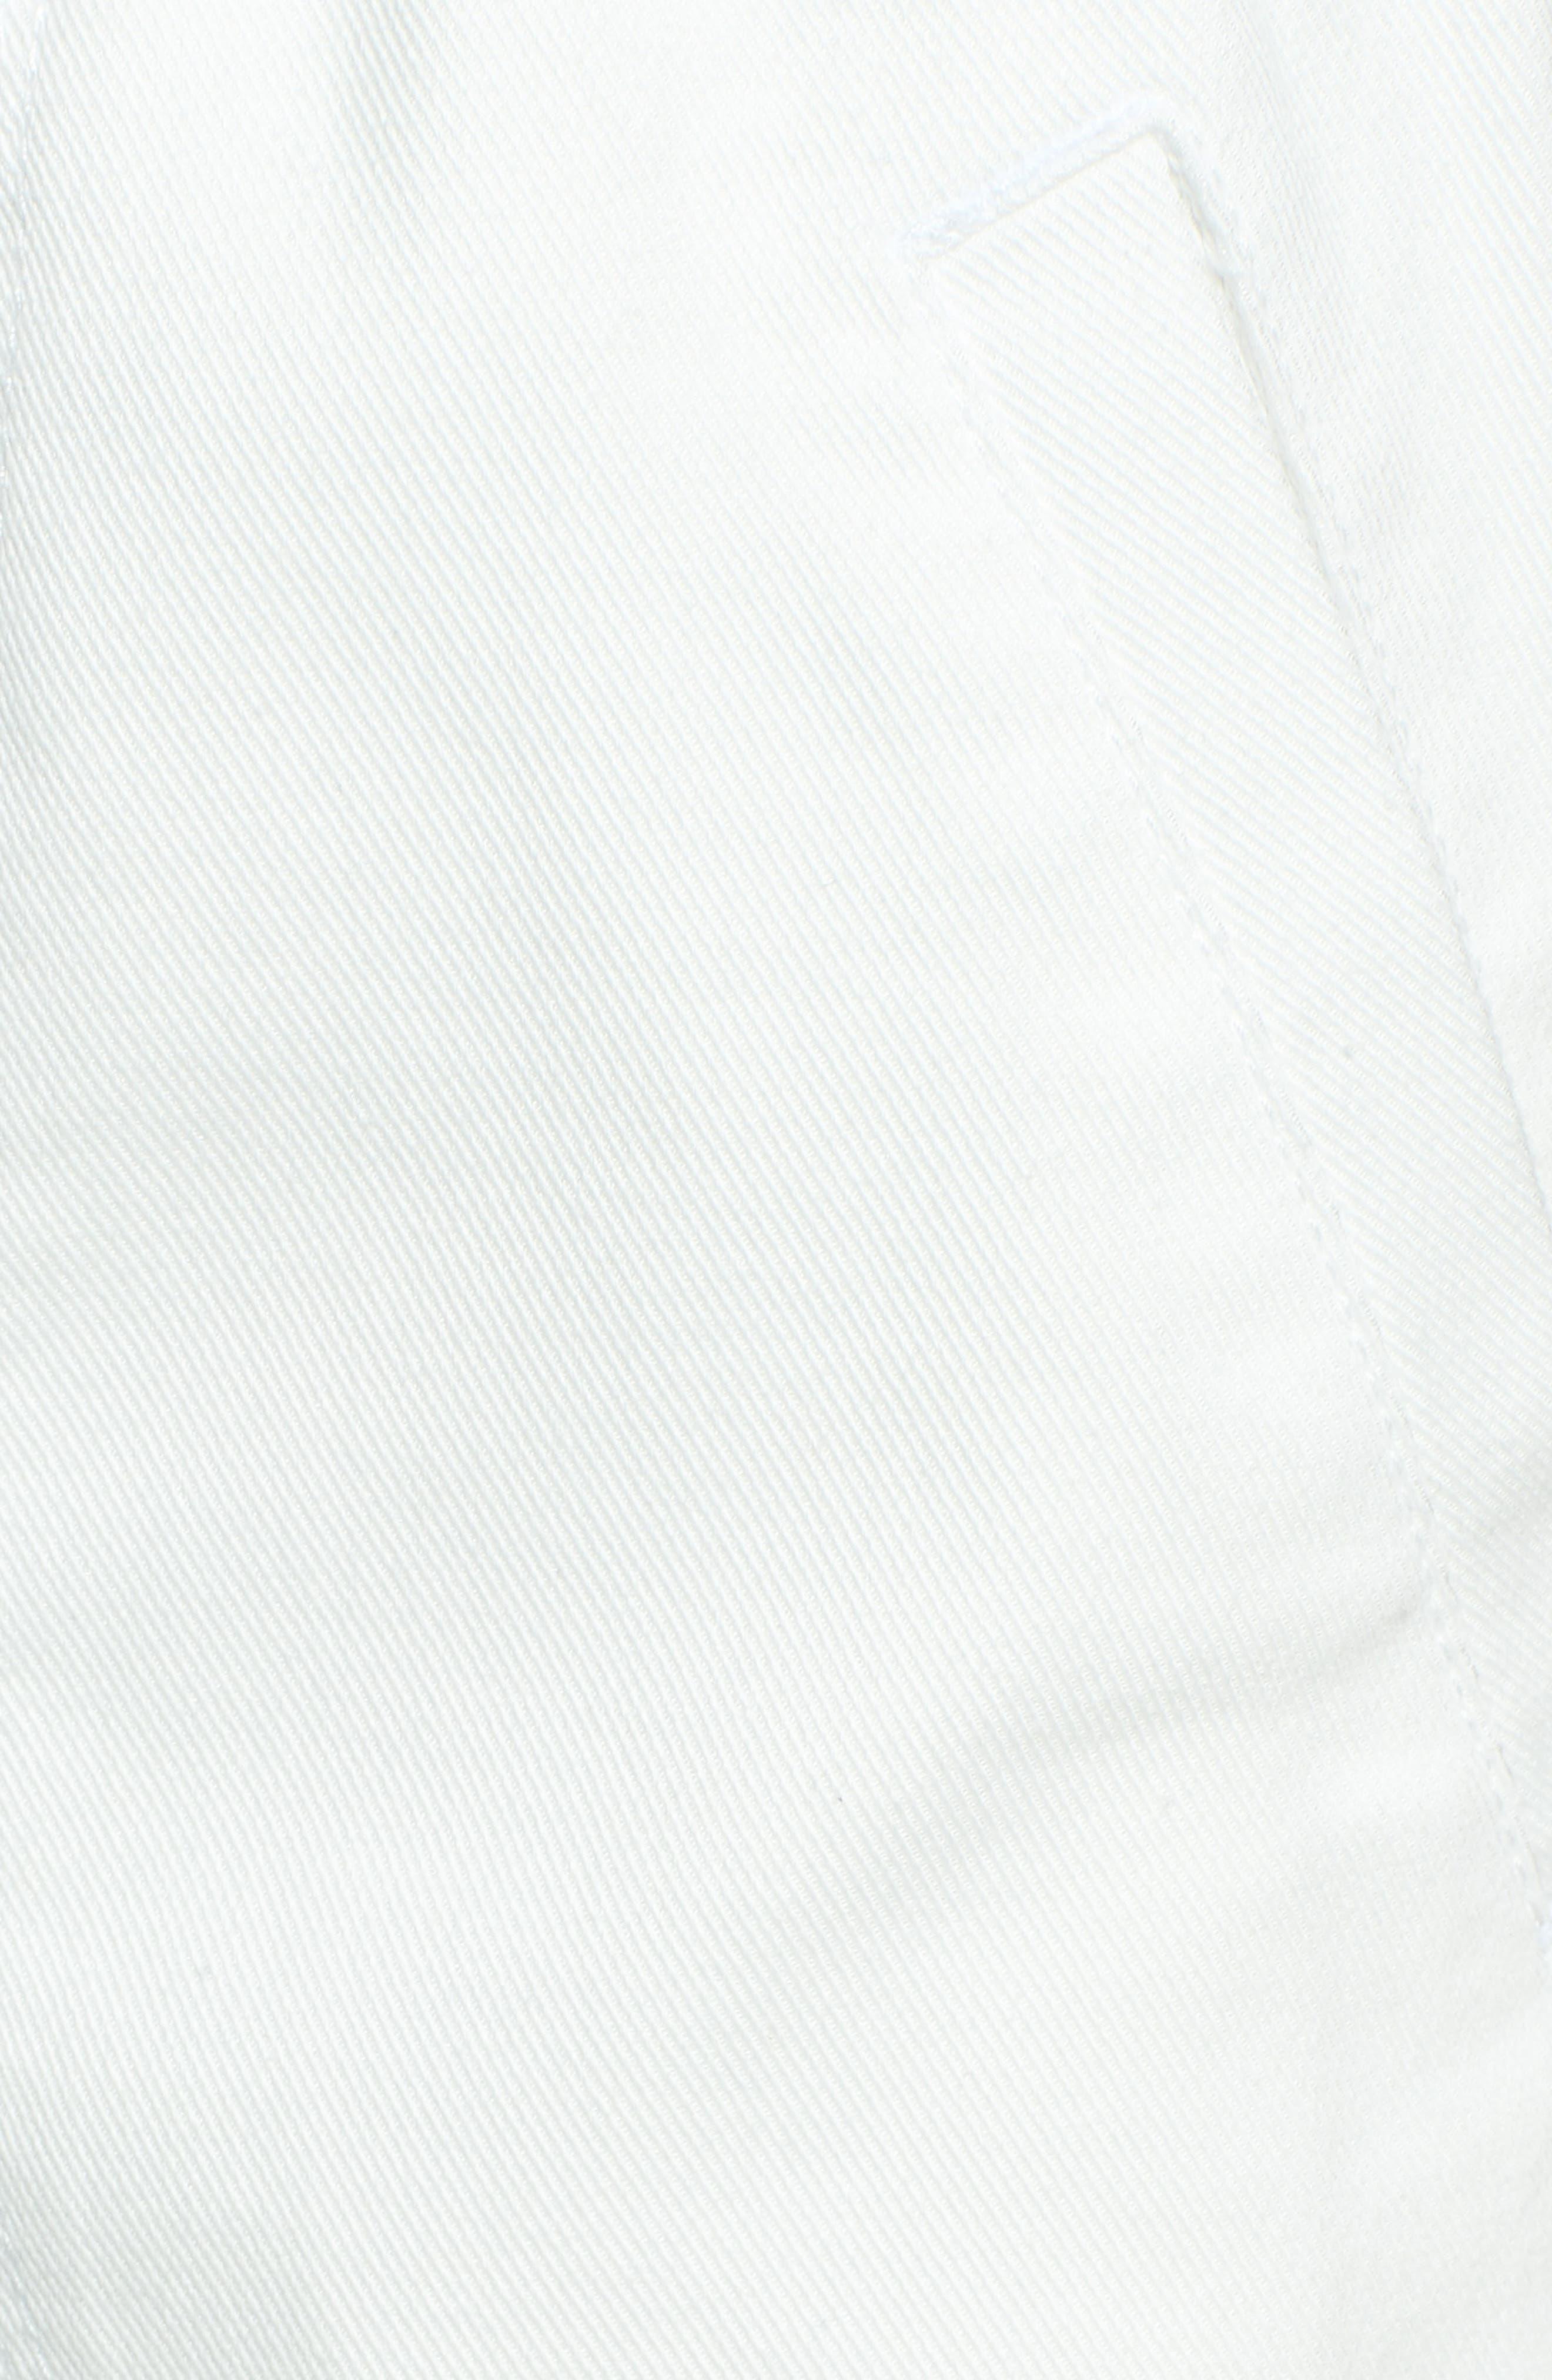 Open Road Drawstring Shorts,                             Alternate thumbnail 5, color,                             Paper White